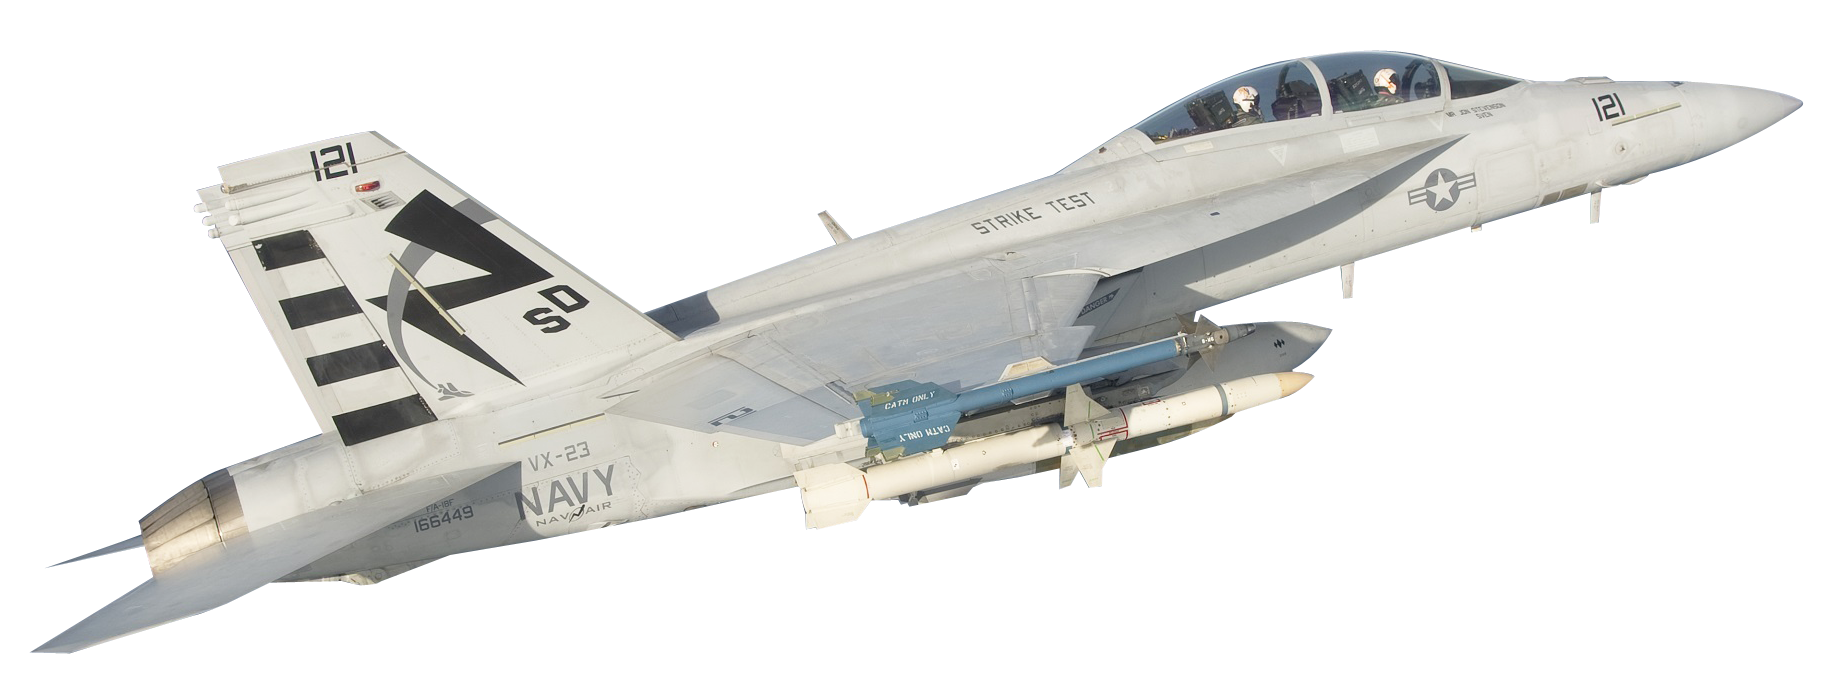 Military Jet Png Transparent Image - Plane, Transparent background PNG HD thumbnail